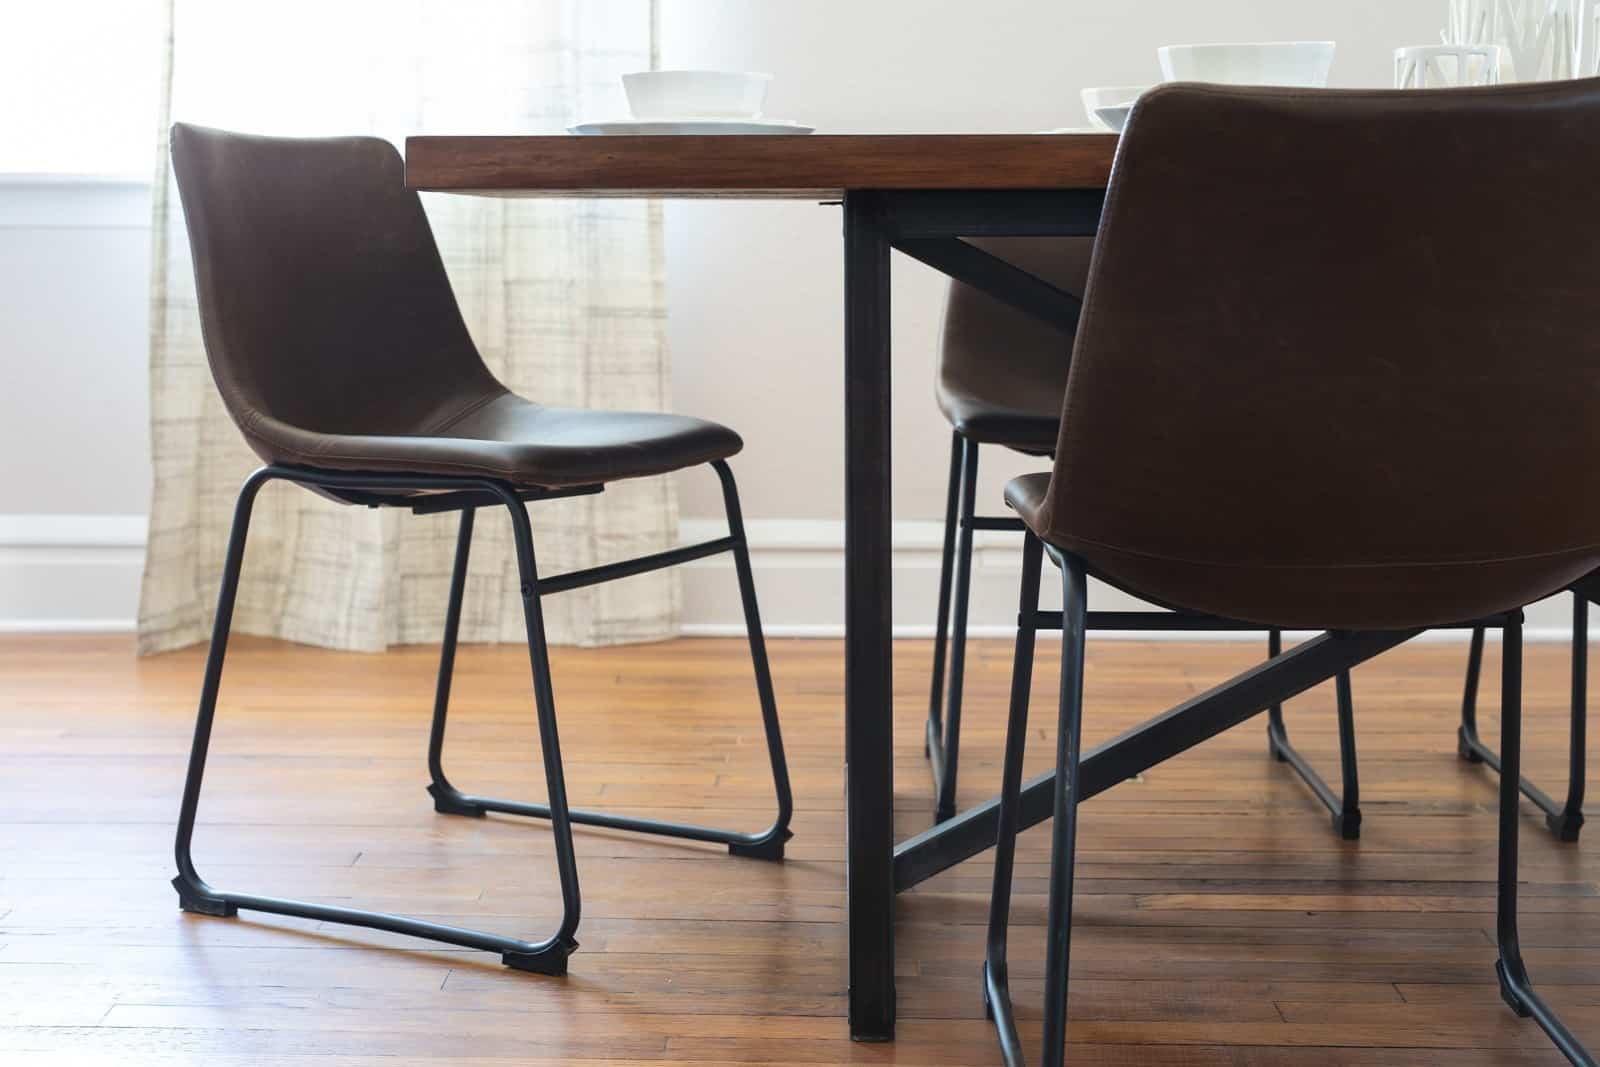 Unruh's Sedona Table